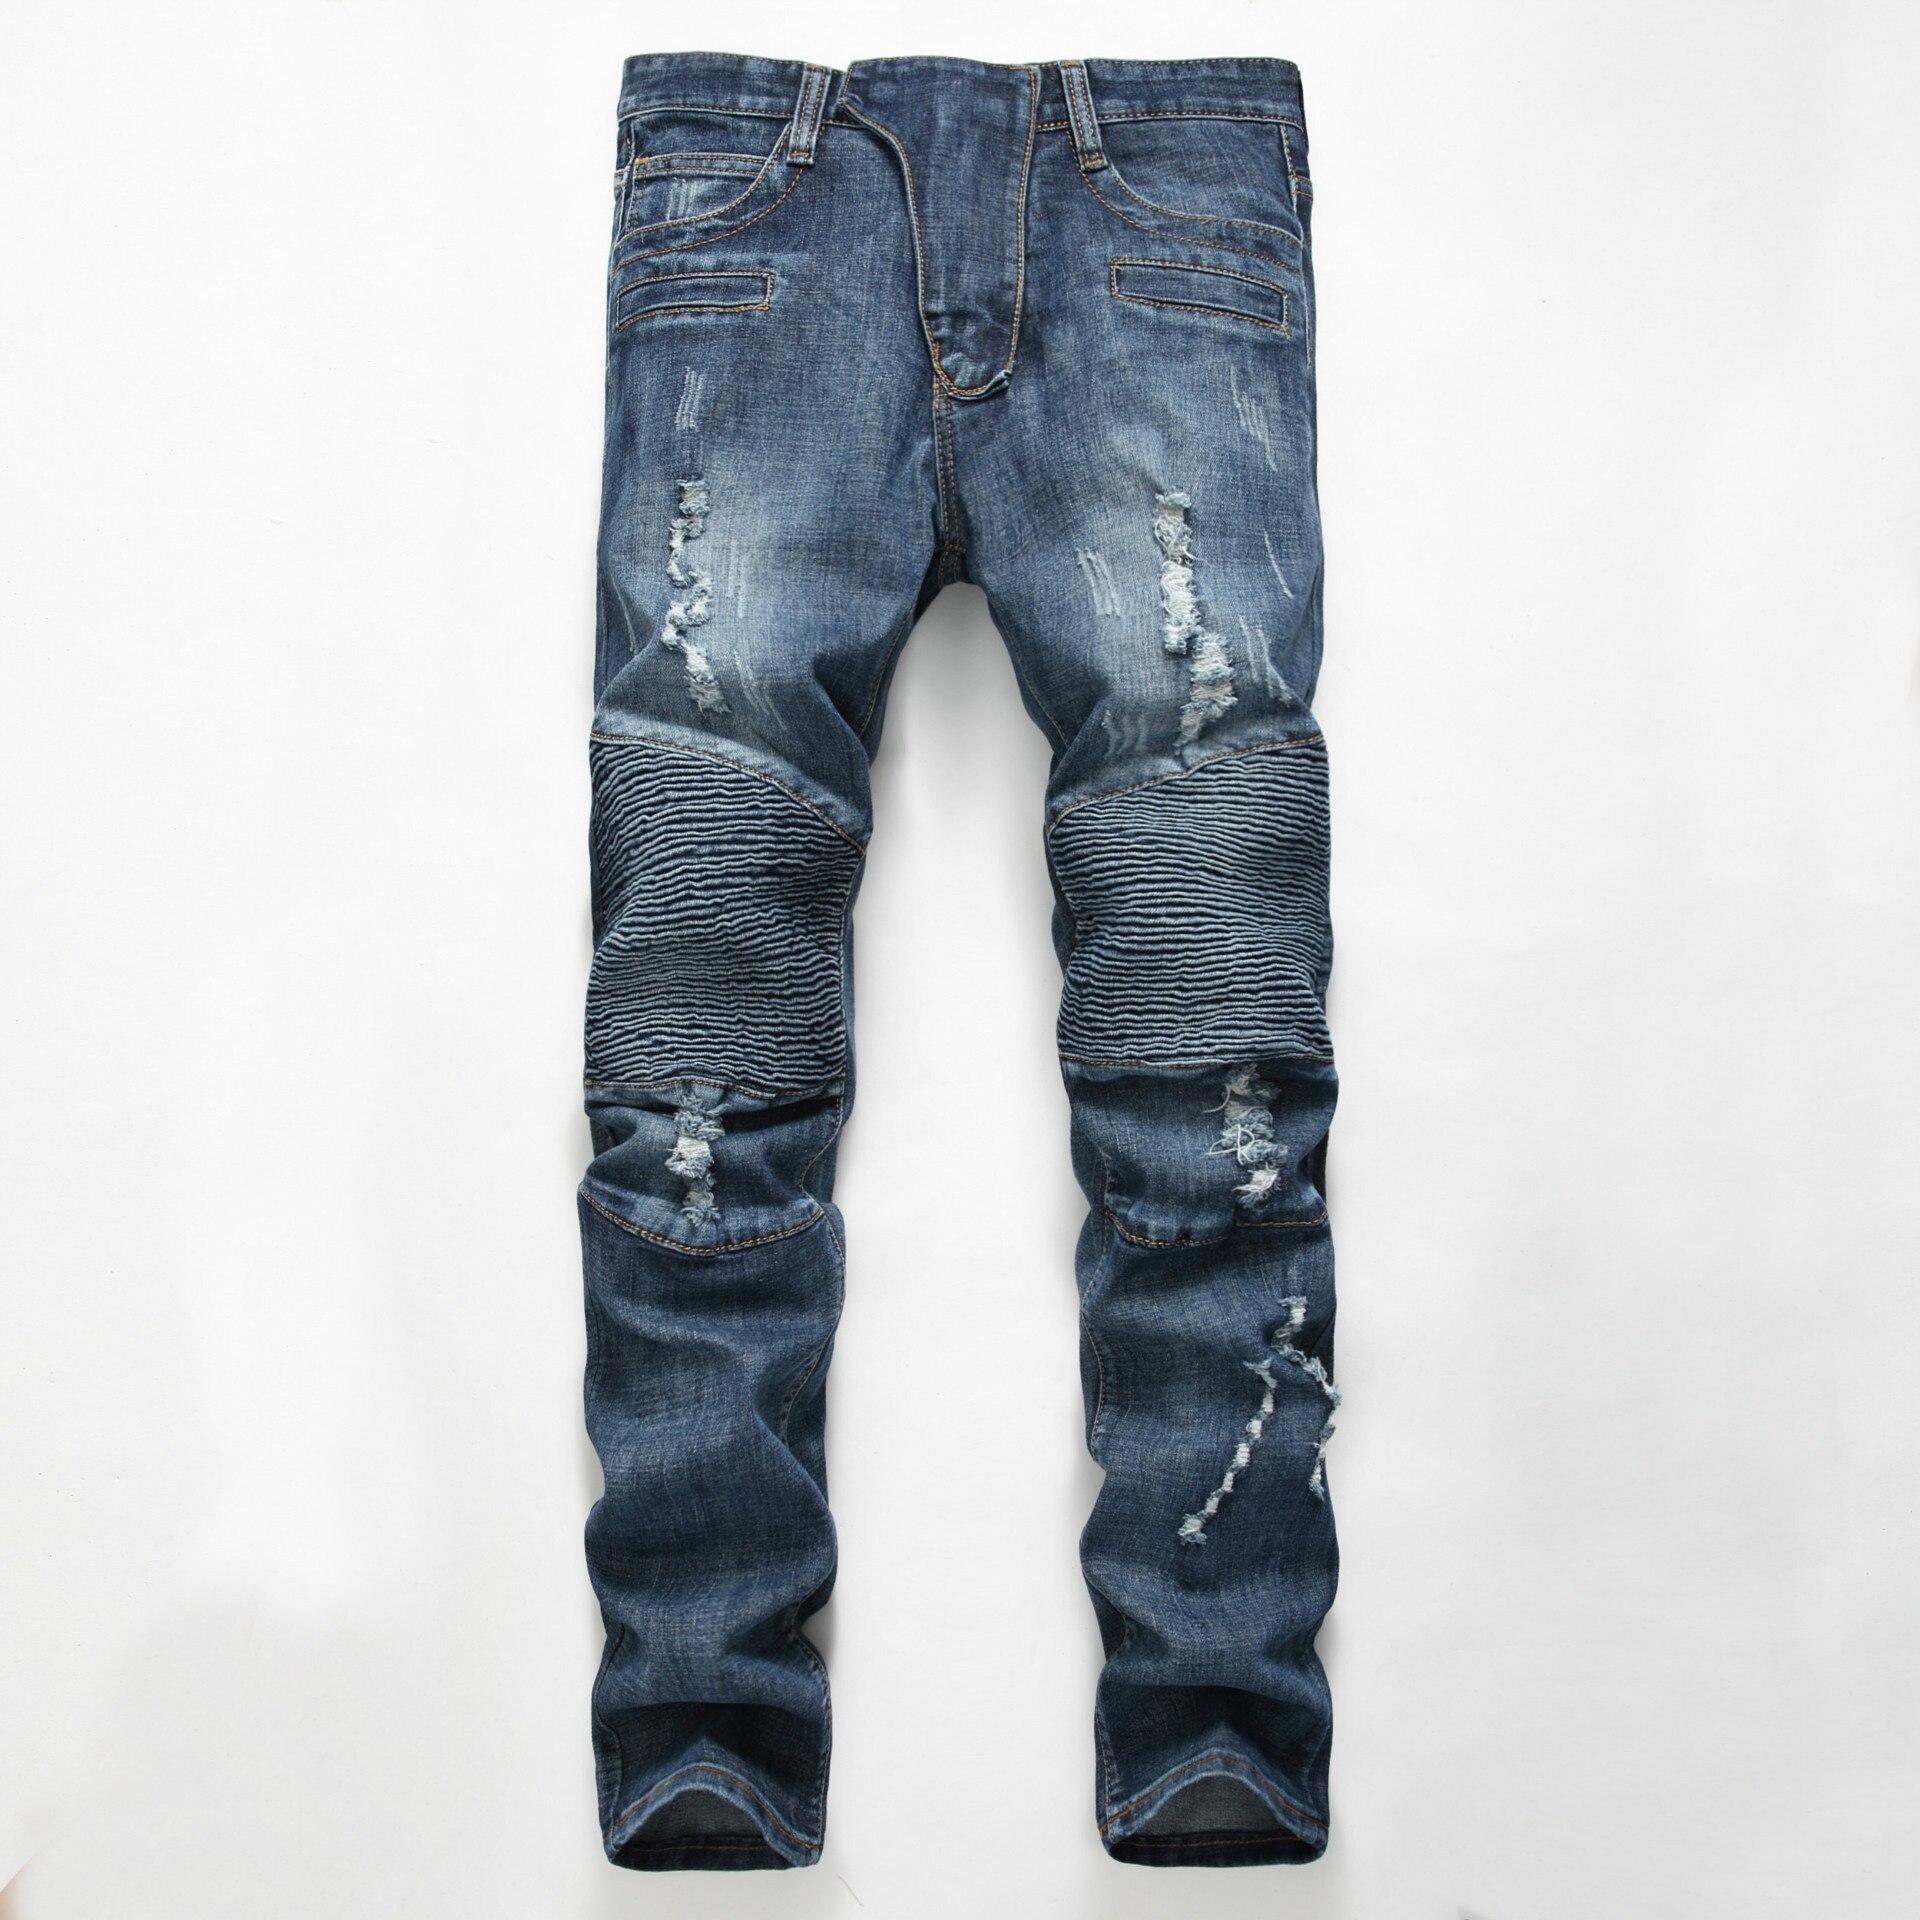 e405a17a2df5e best top 10 designes jeans ideas and get free shipping - li6eeanb